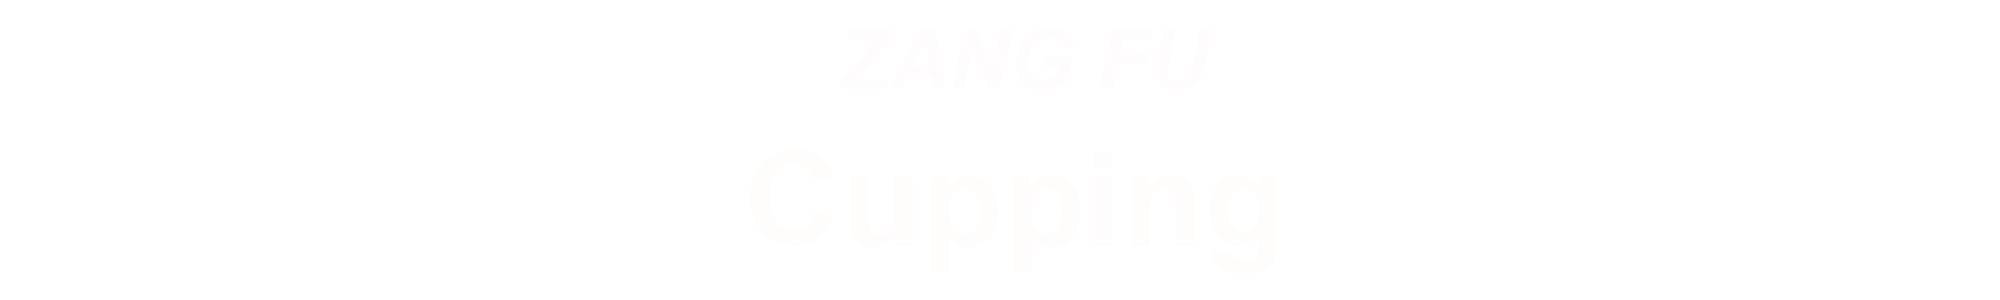 ZANGFU CUPPING